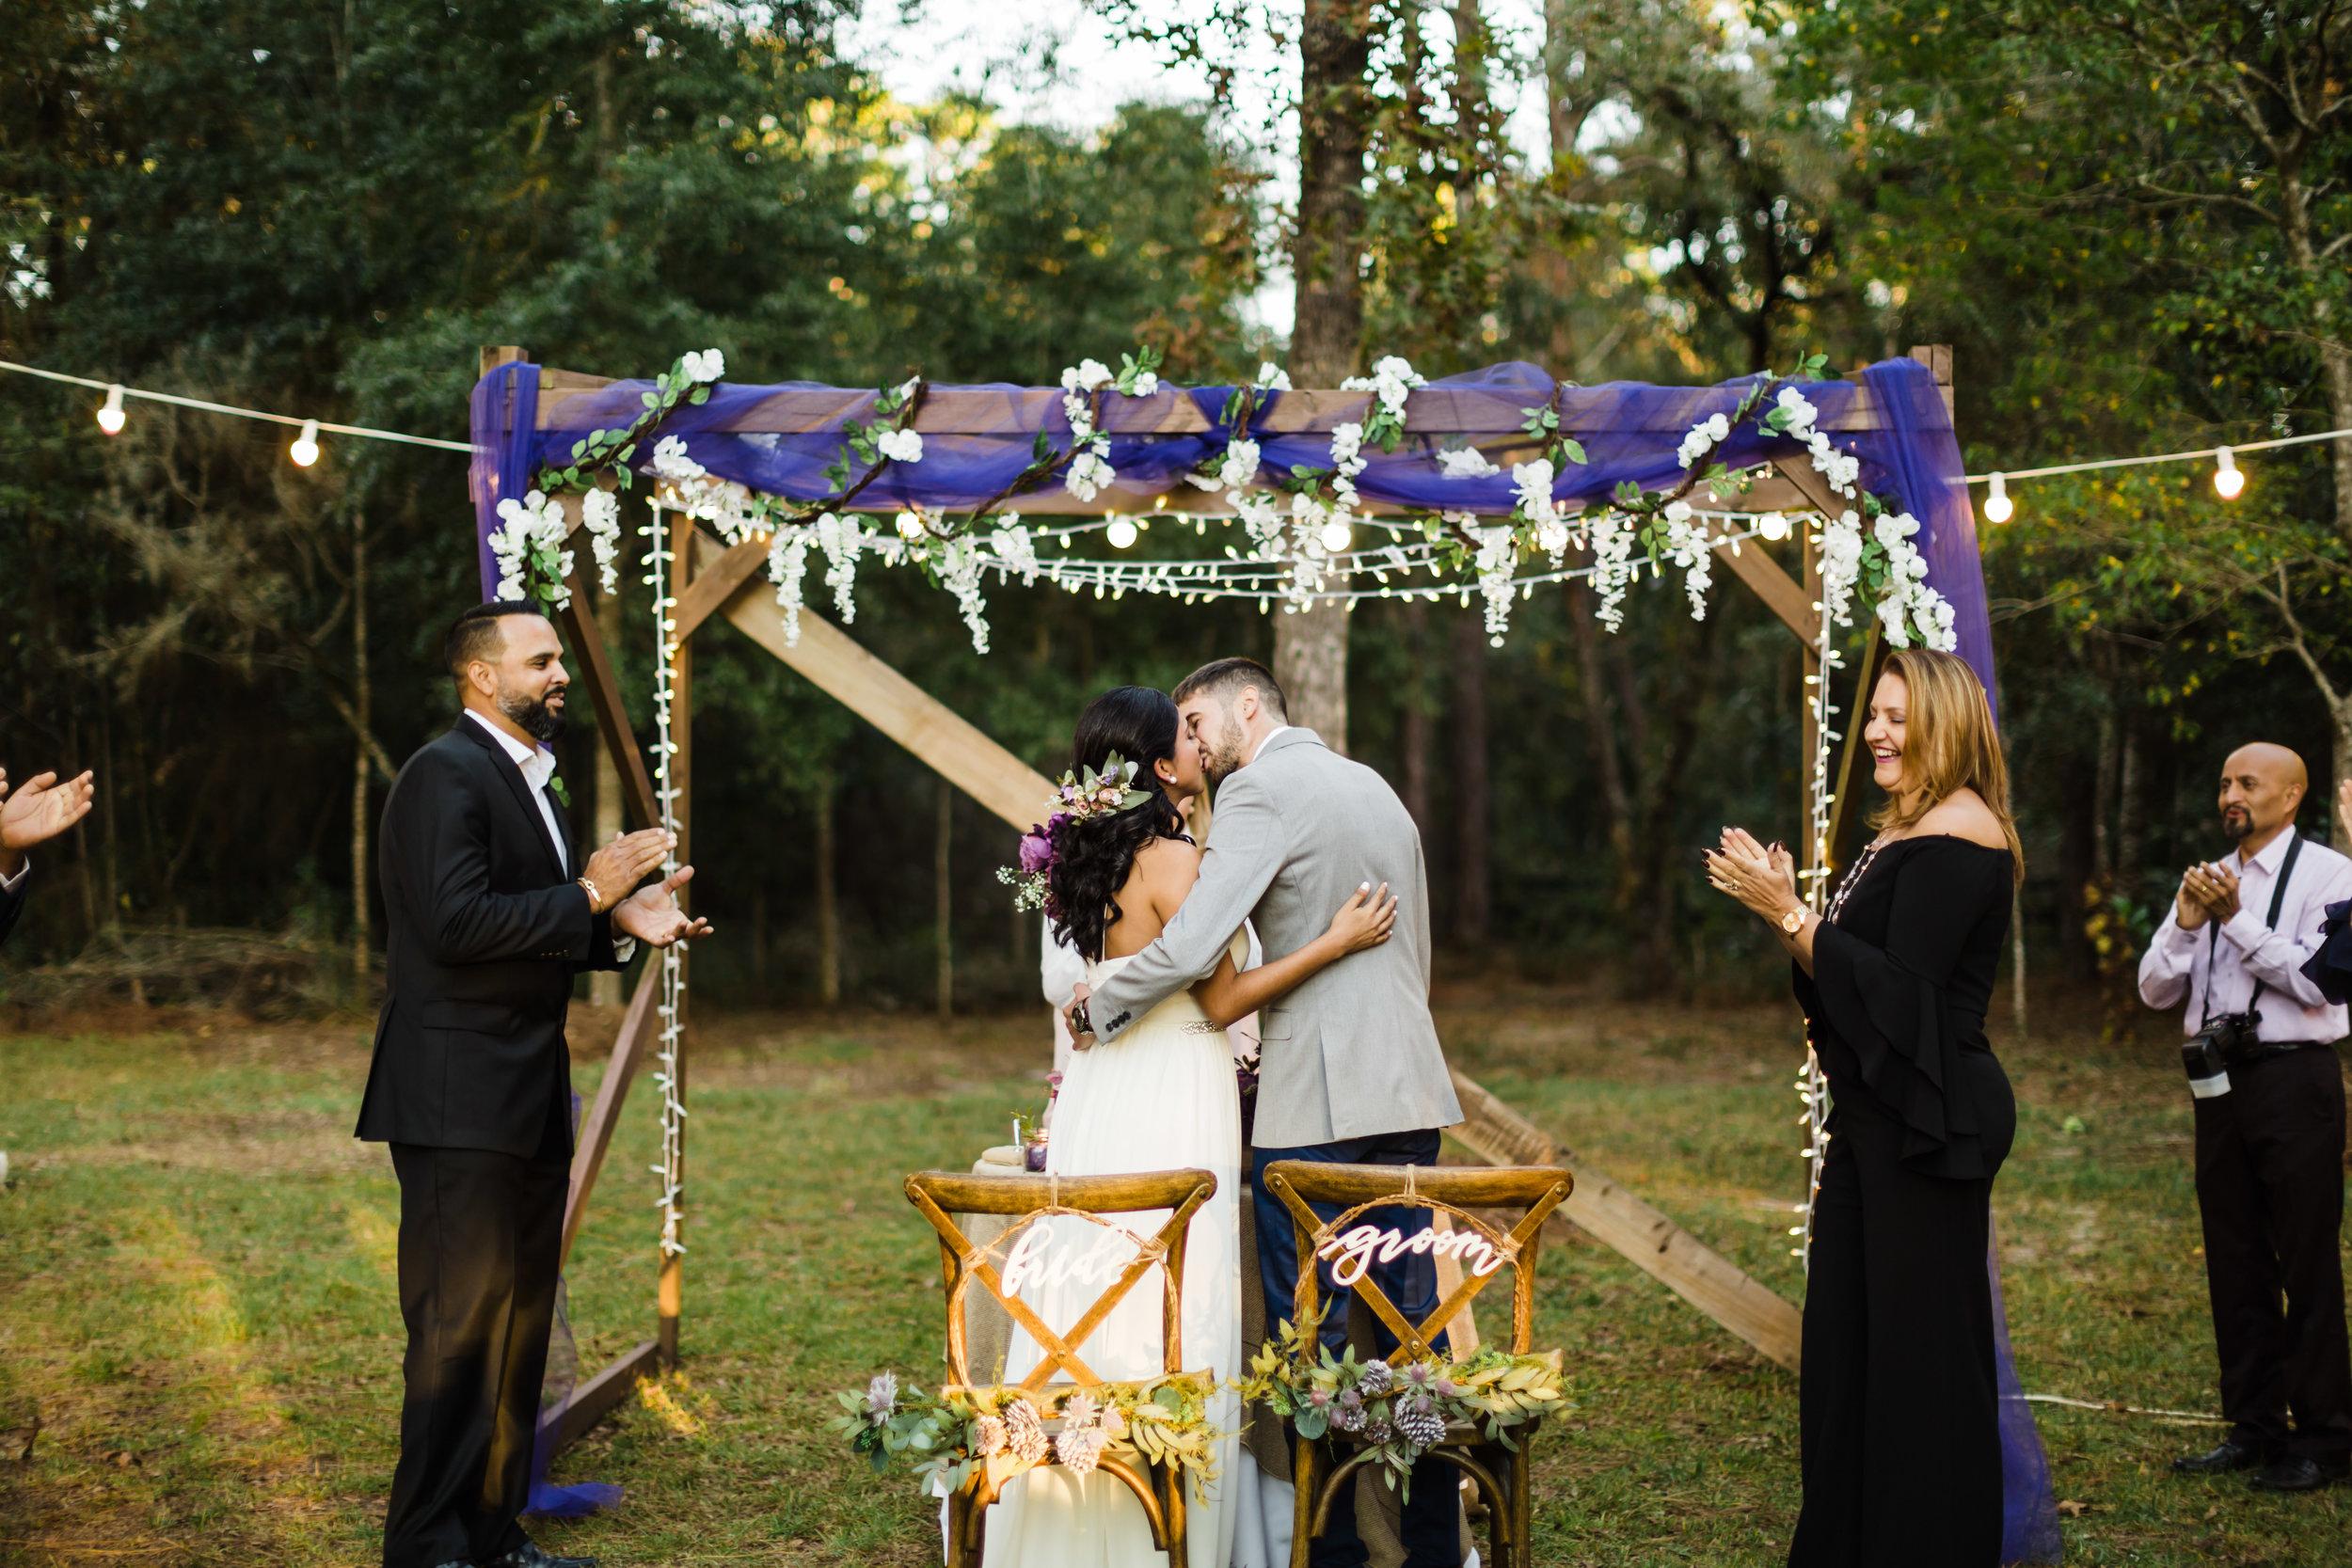 2018.11.03 Jael and Edel Ocala Wedding FINALS (257 of 441).jpg